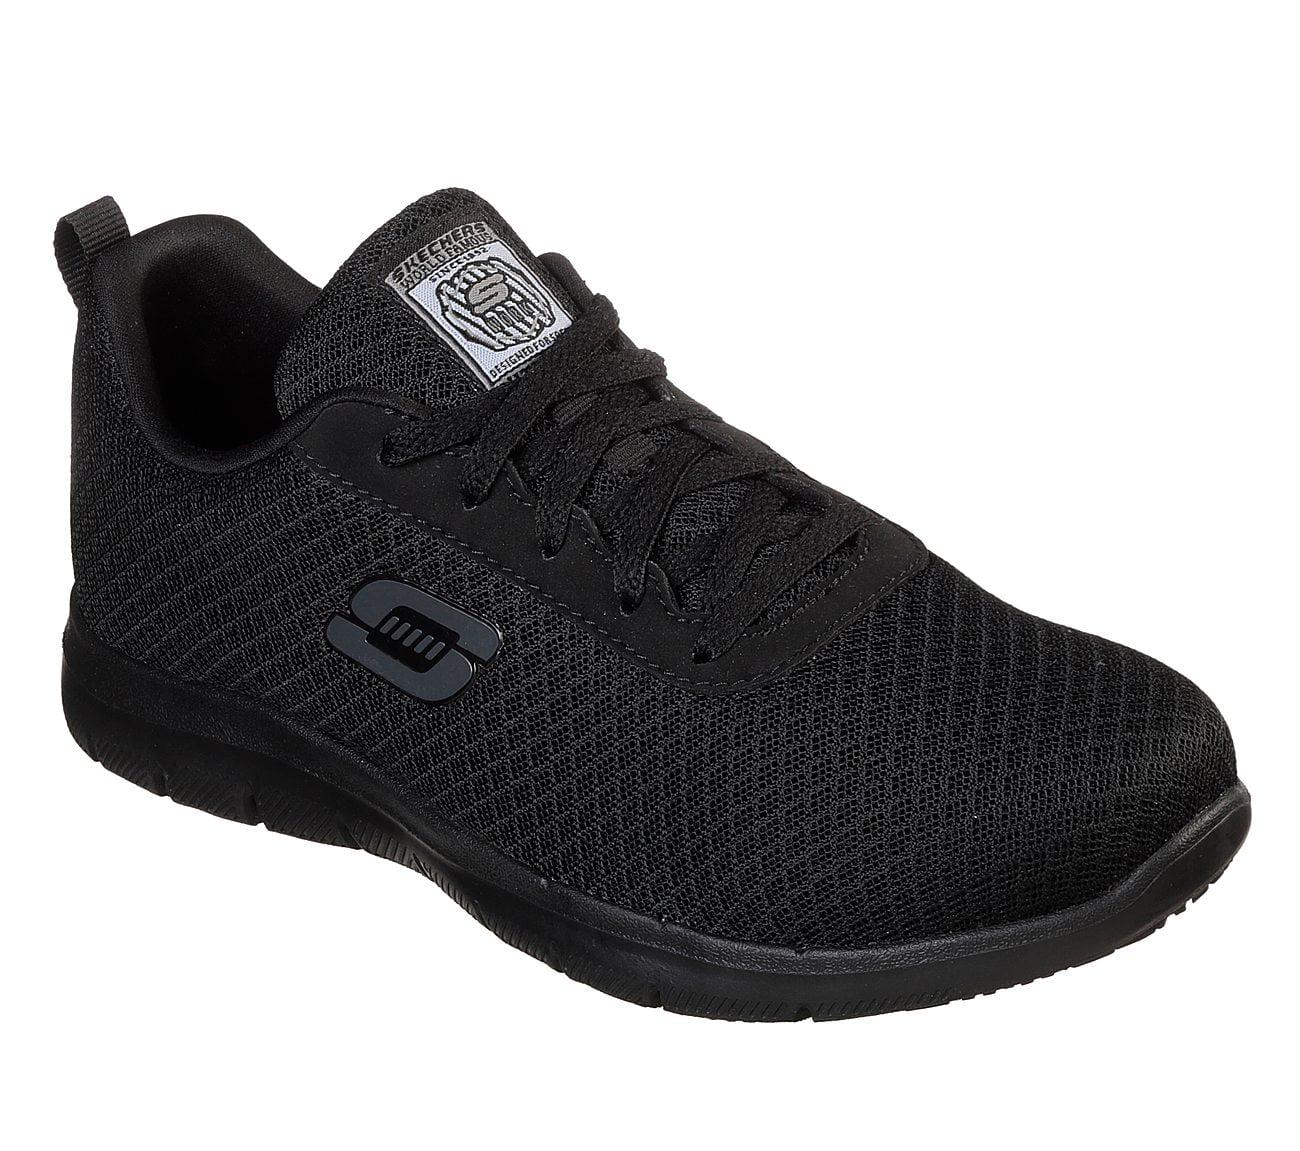 skechers slip on work shoes